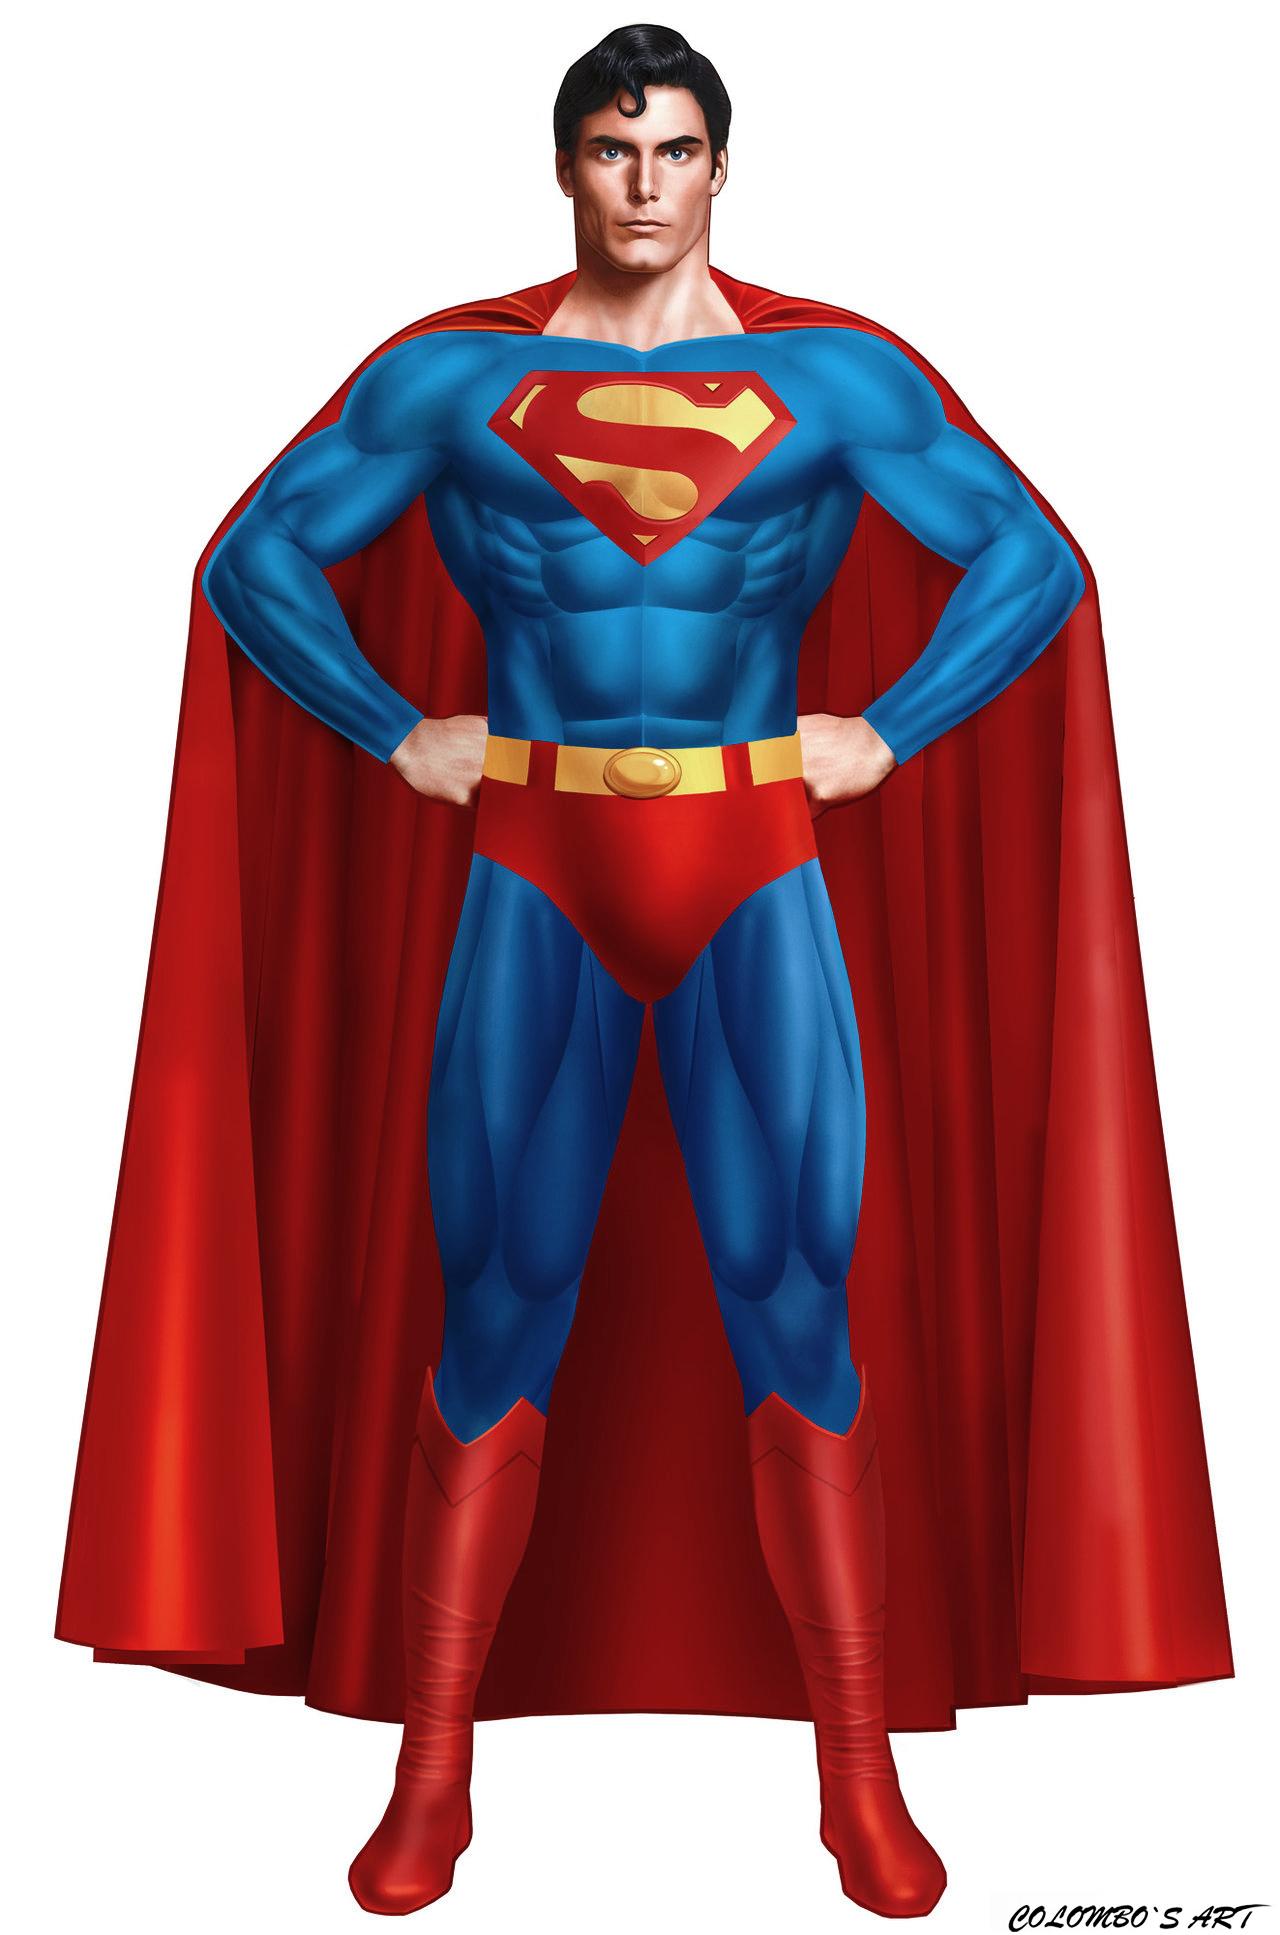 FOREVER_SUPERMAN_by_supersebas.jpg